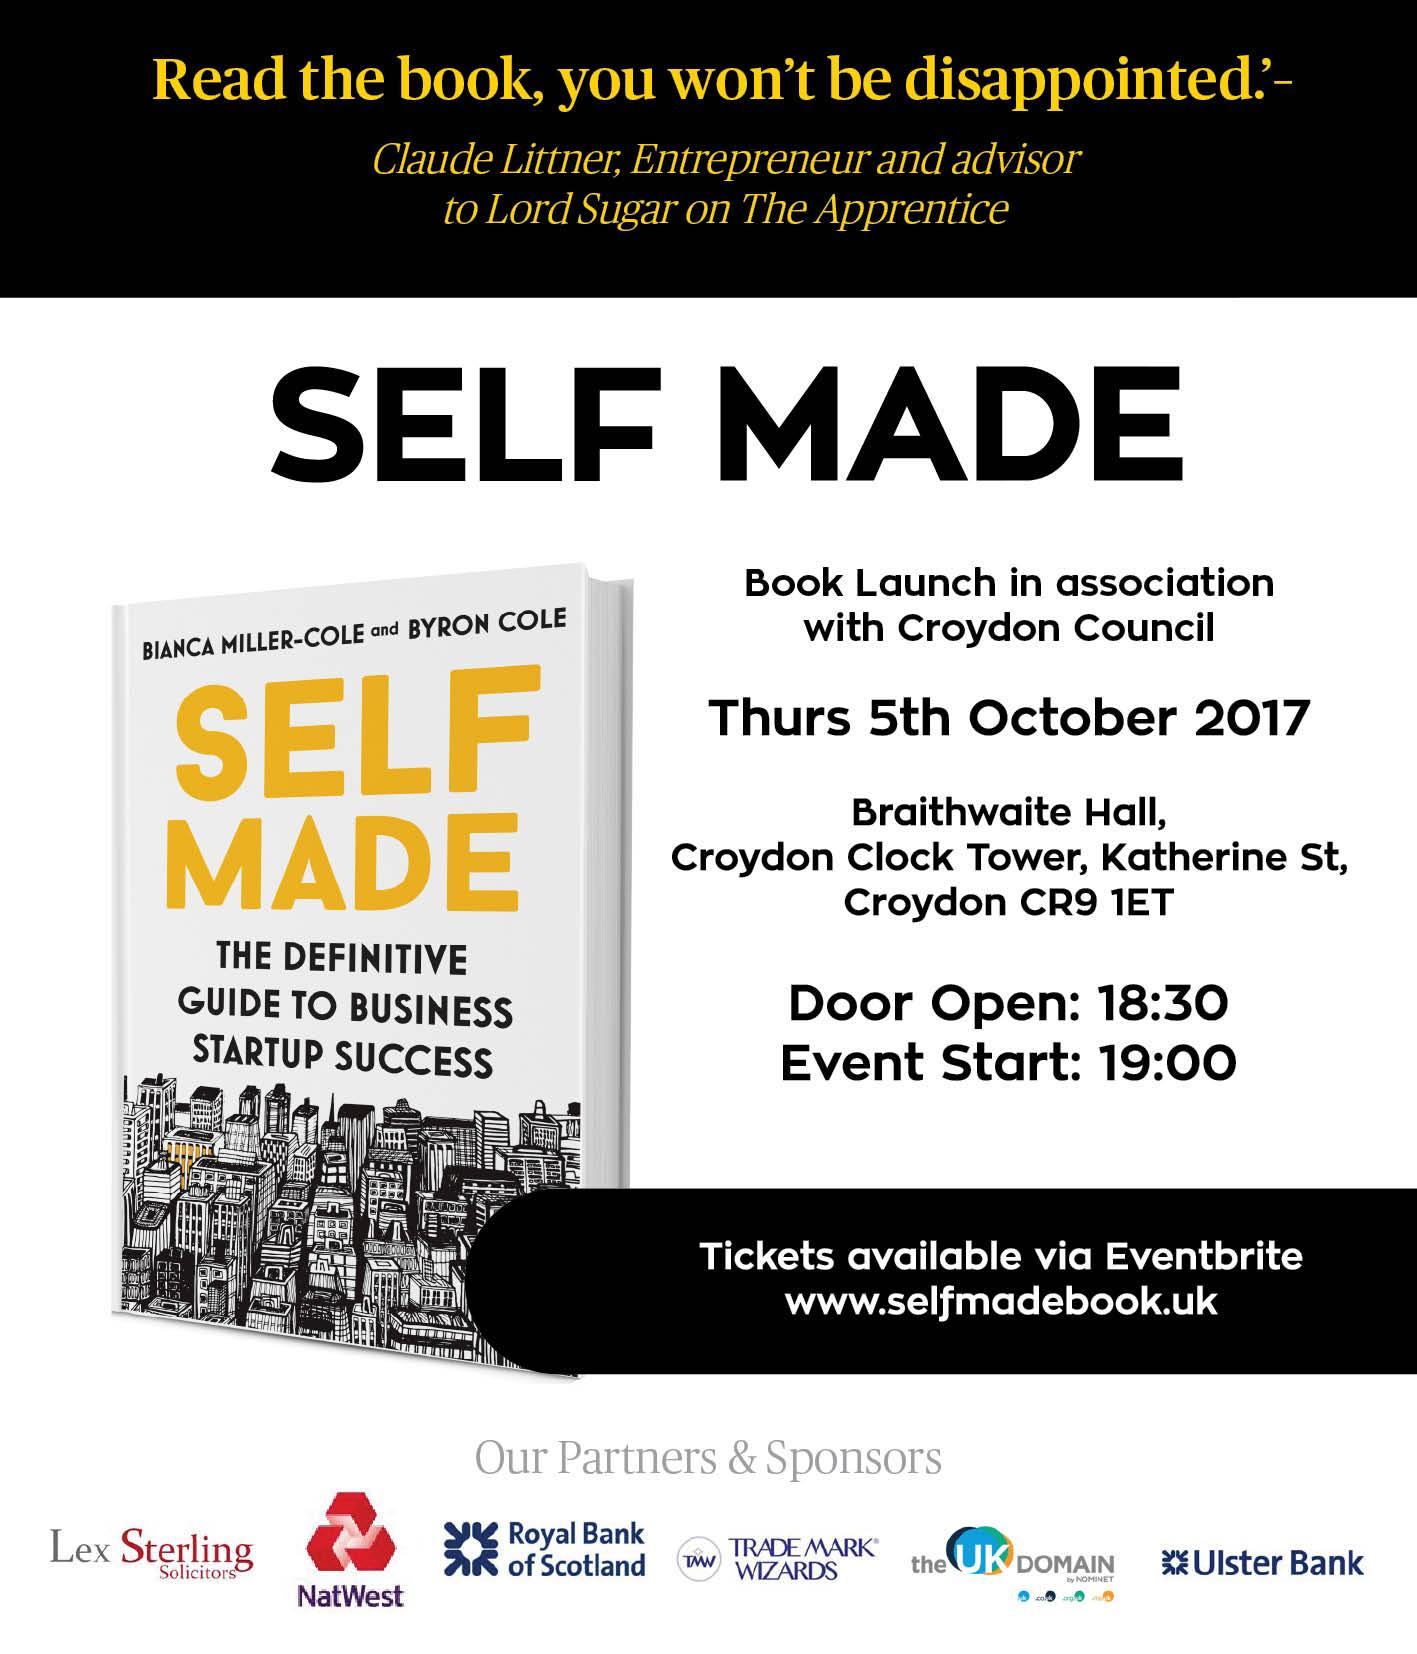 Self Made Book Launch in association Croydon Council